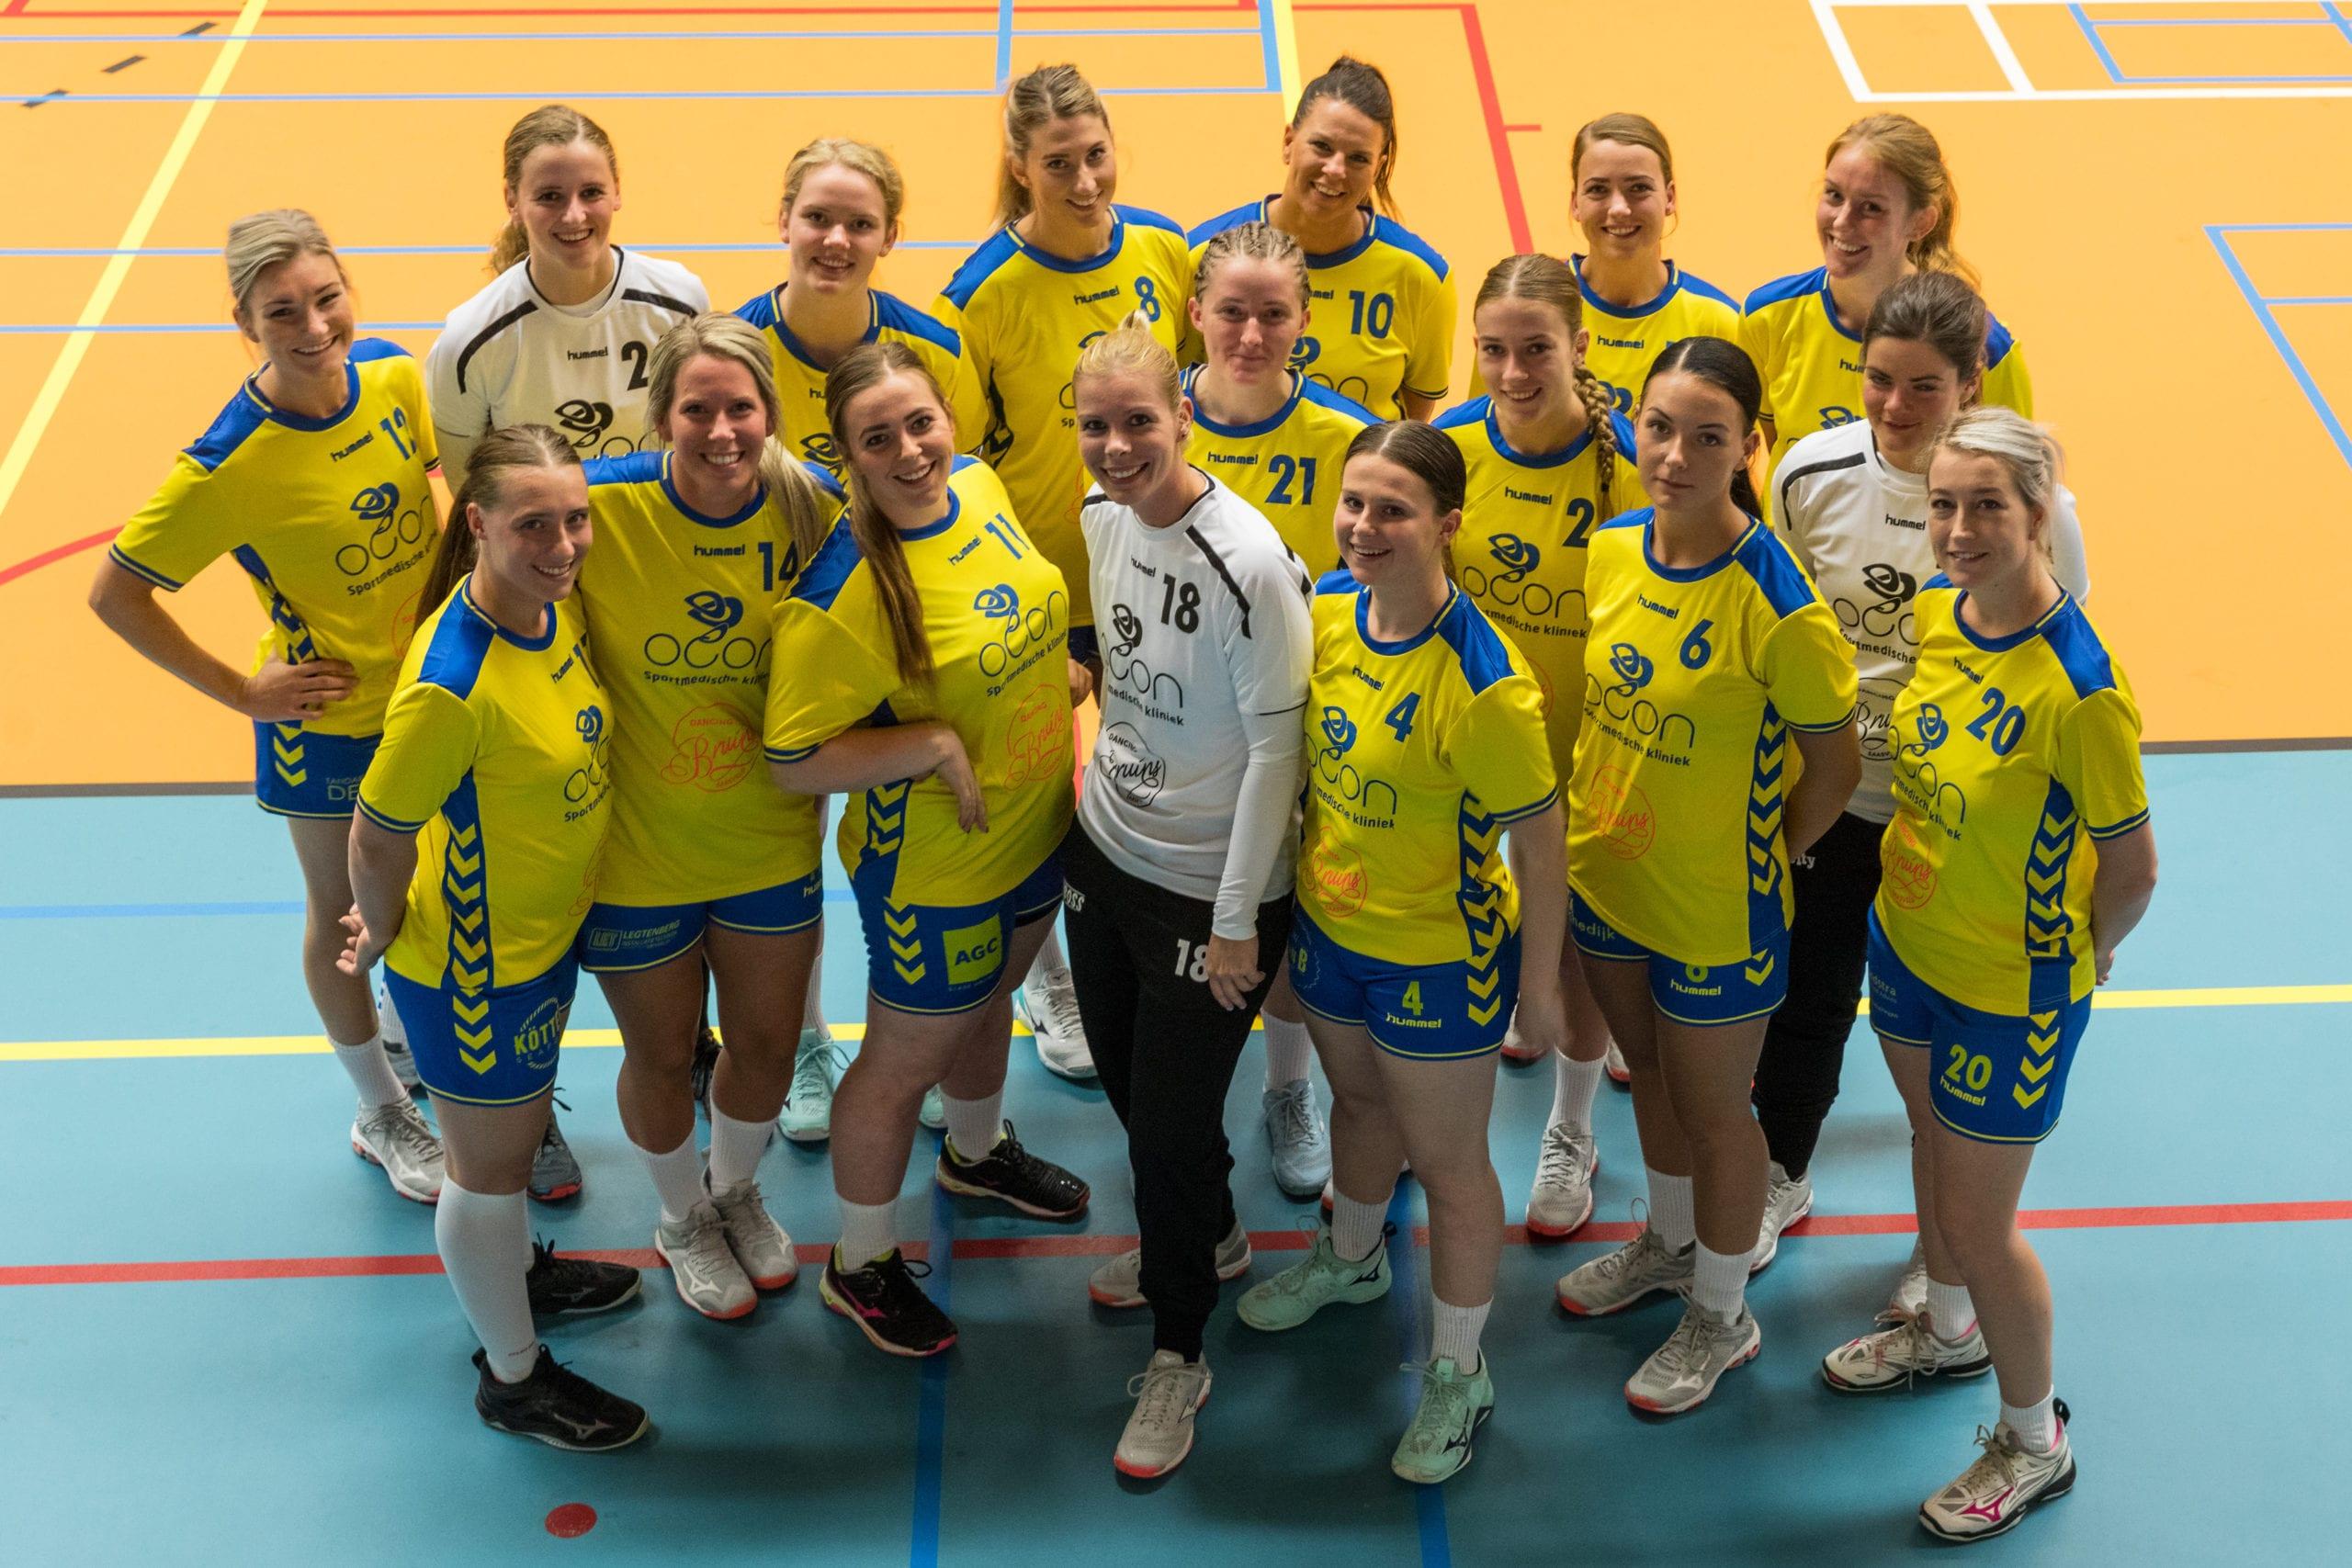 Teamfoto Borhave dames 1 2019/2020